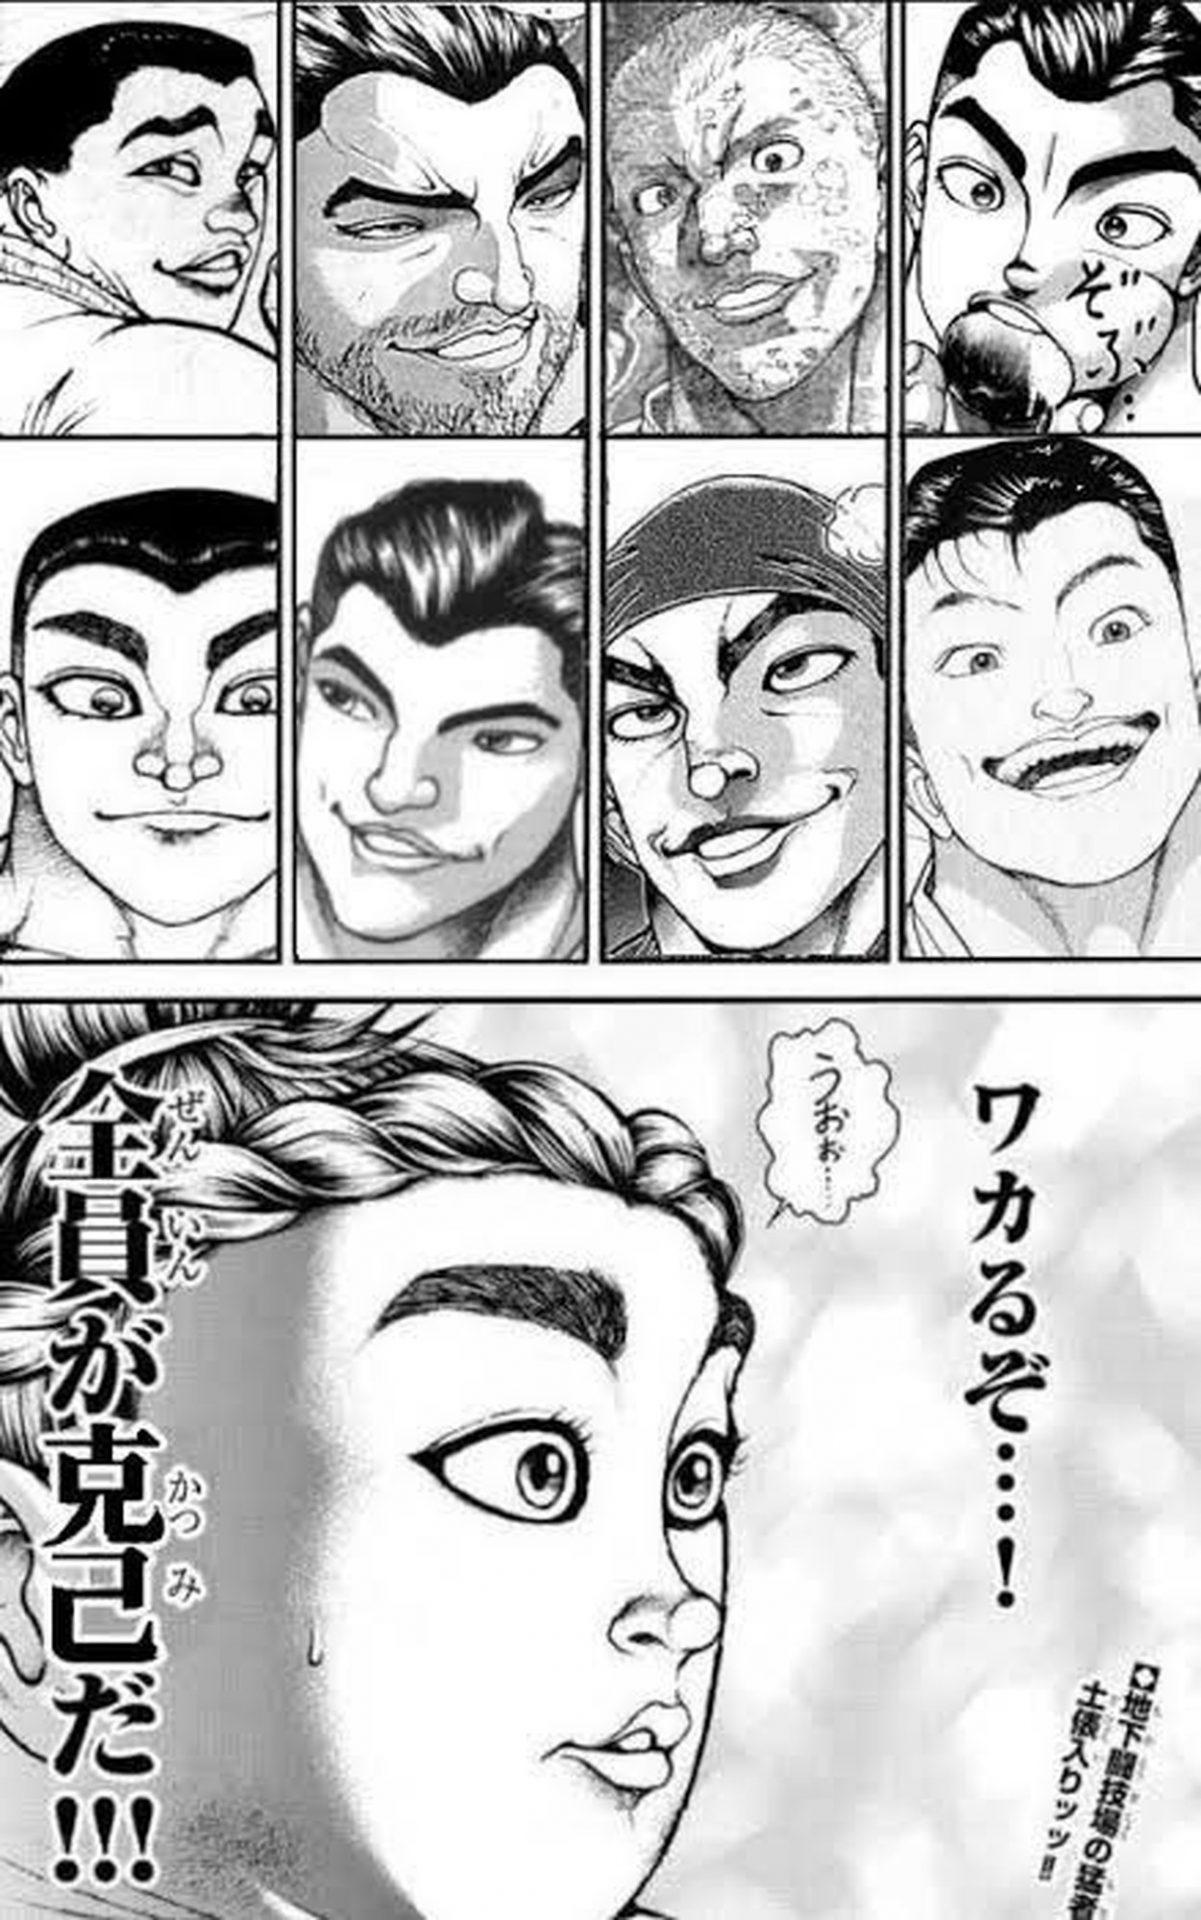 fe5f21a9 - 【腹筋崩壊】刃牙シリーズの面白いコラ画像まとめてみた!!